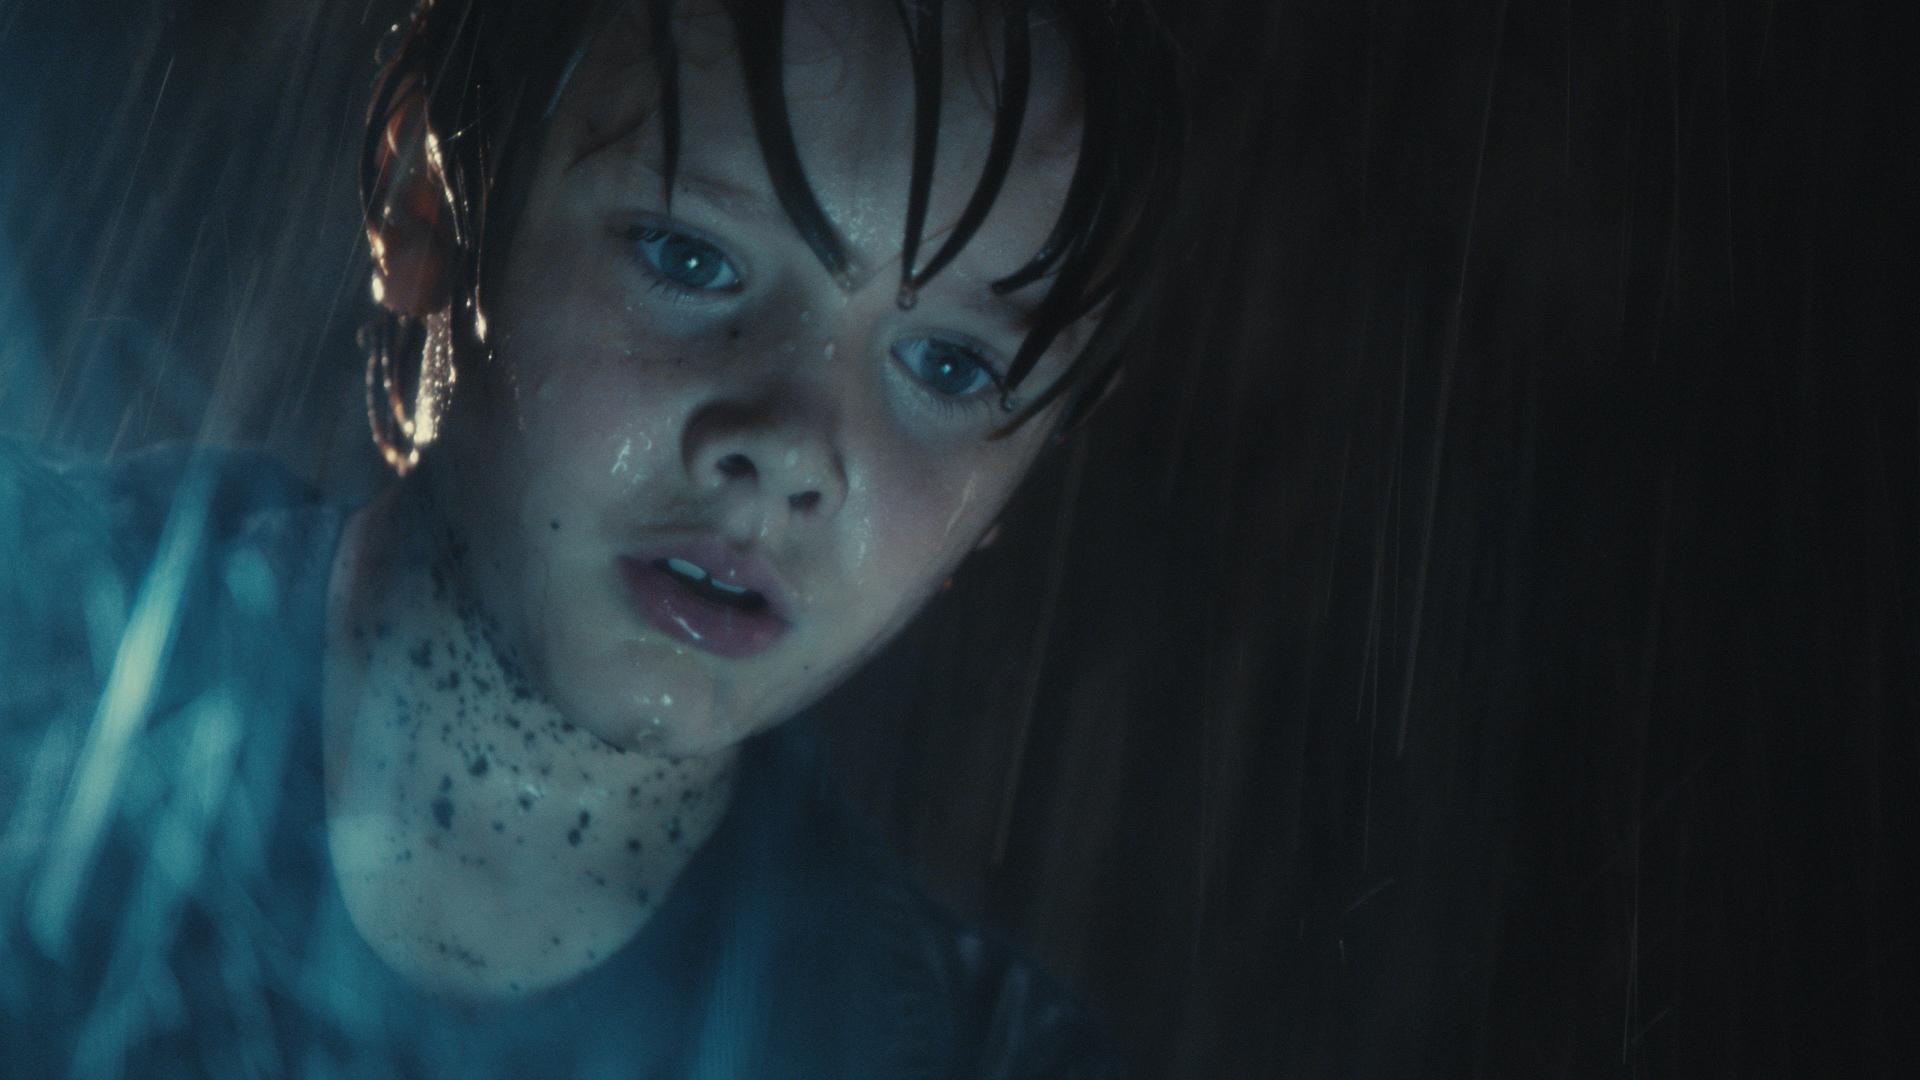 Dakota Goyo – Son, Brother, Friend, Student